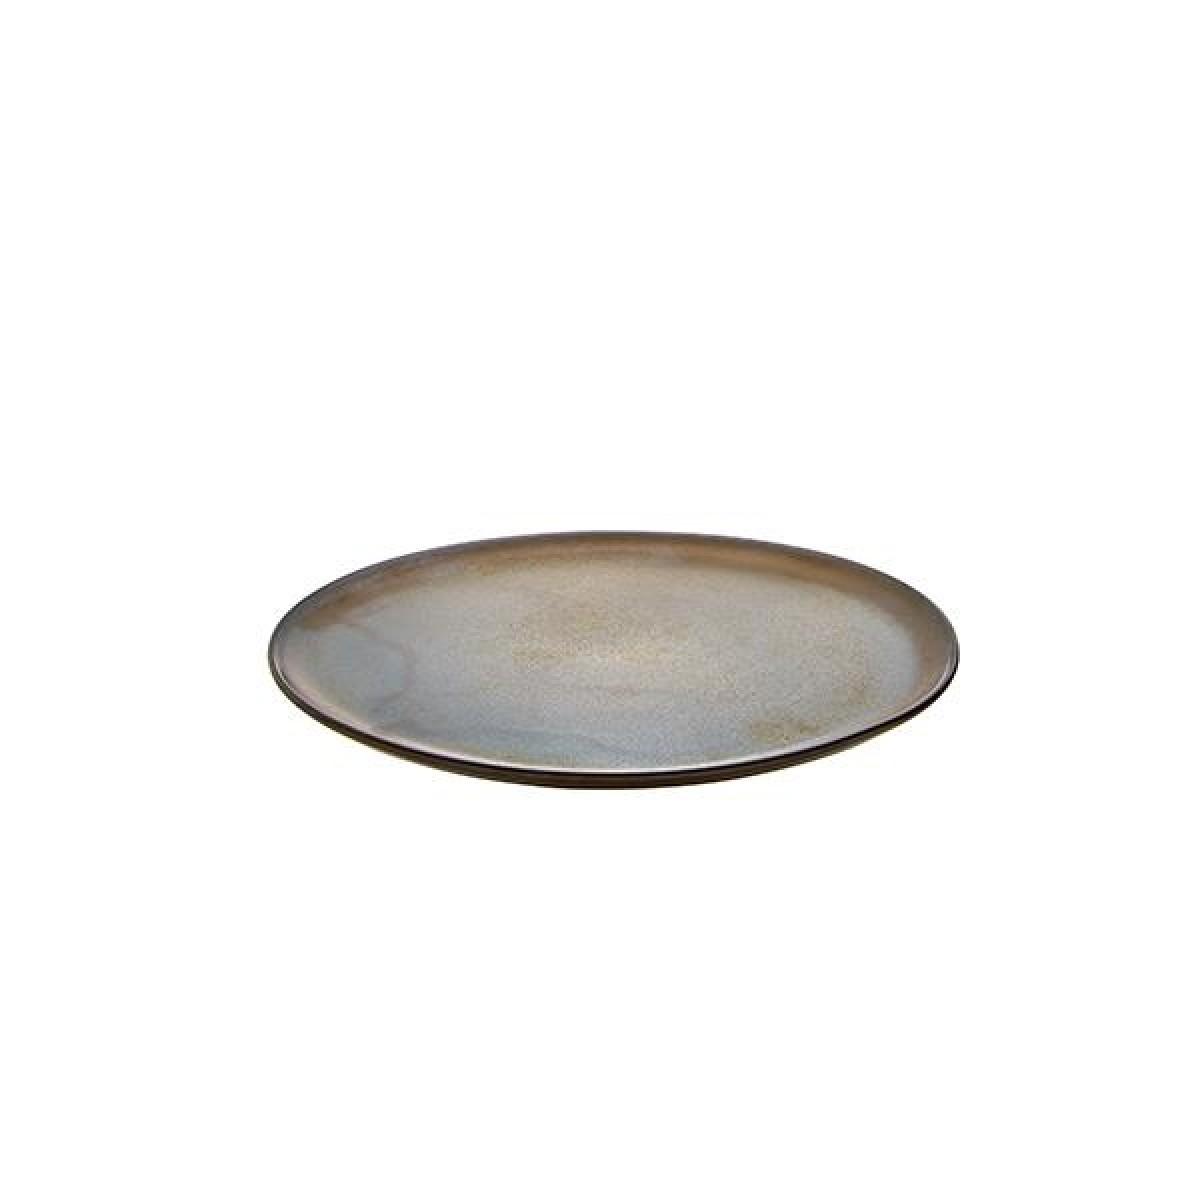 AIDA Raw frokosttallerken 23 cm - metallic brown